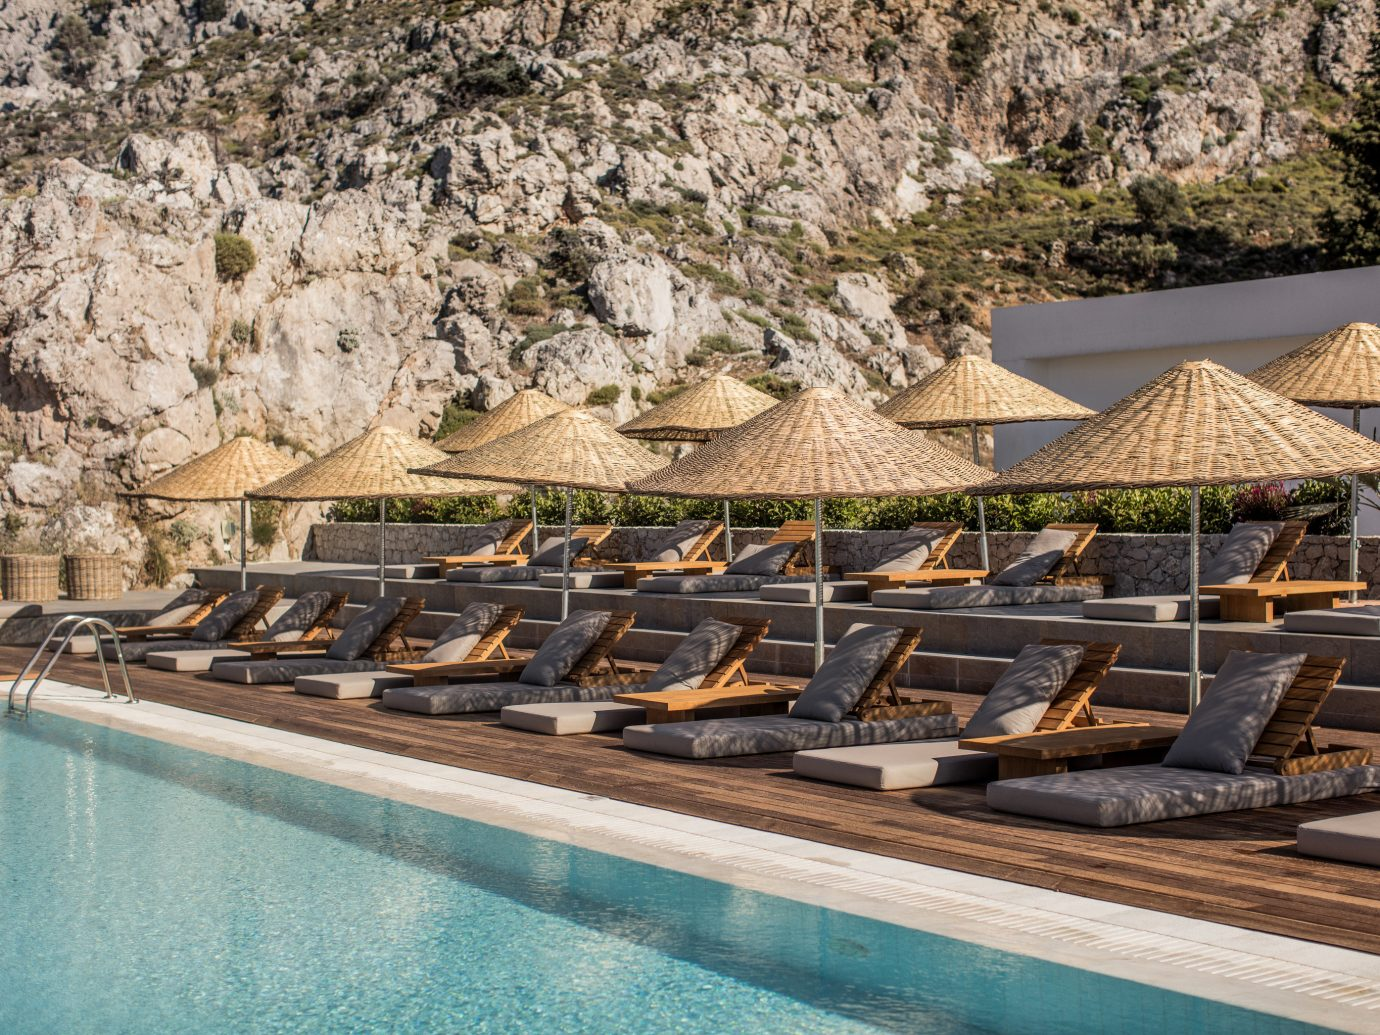 Hotels outdoor swimming pool Resort Nature Pool Boat